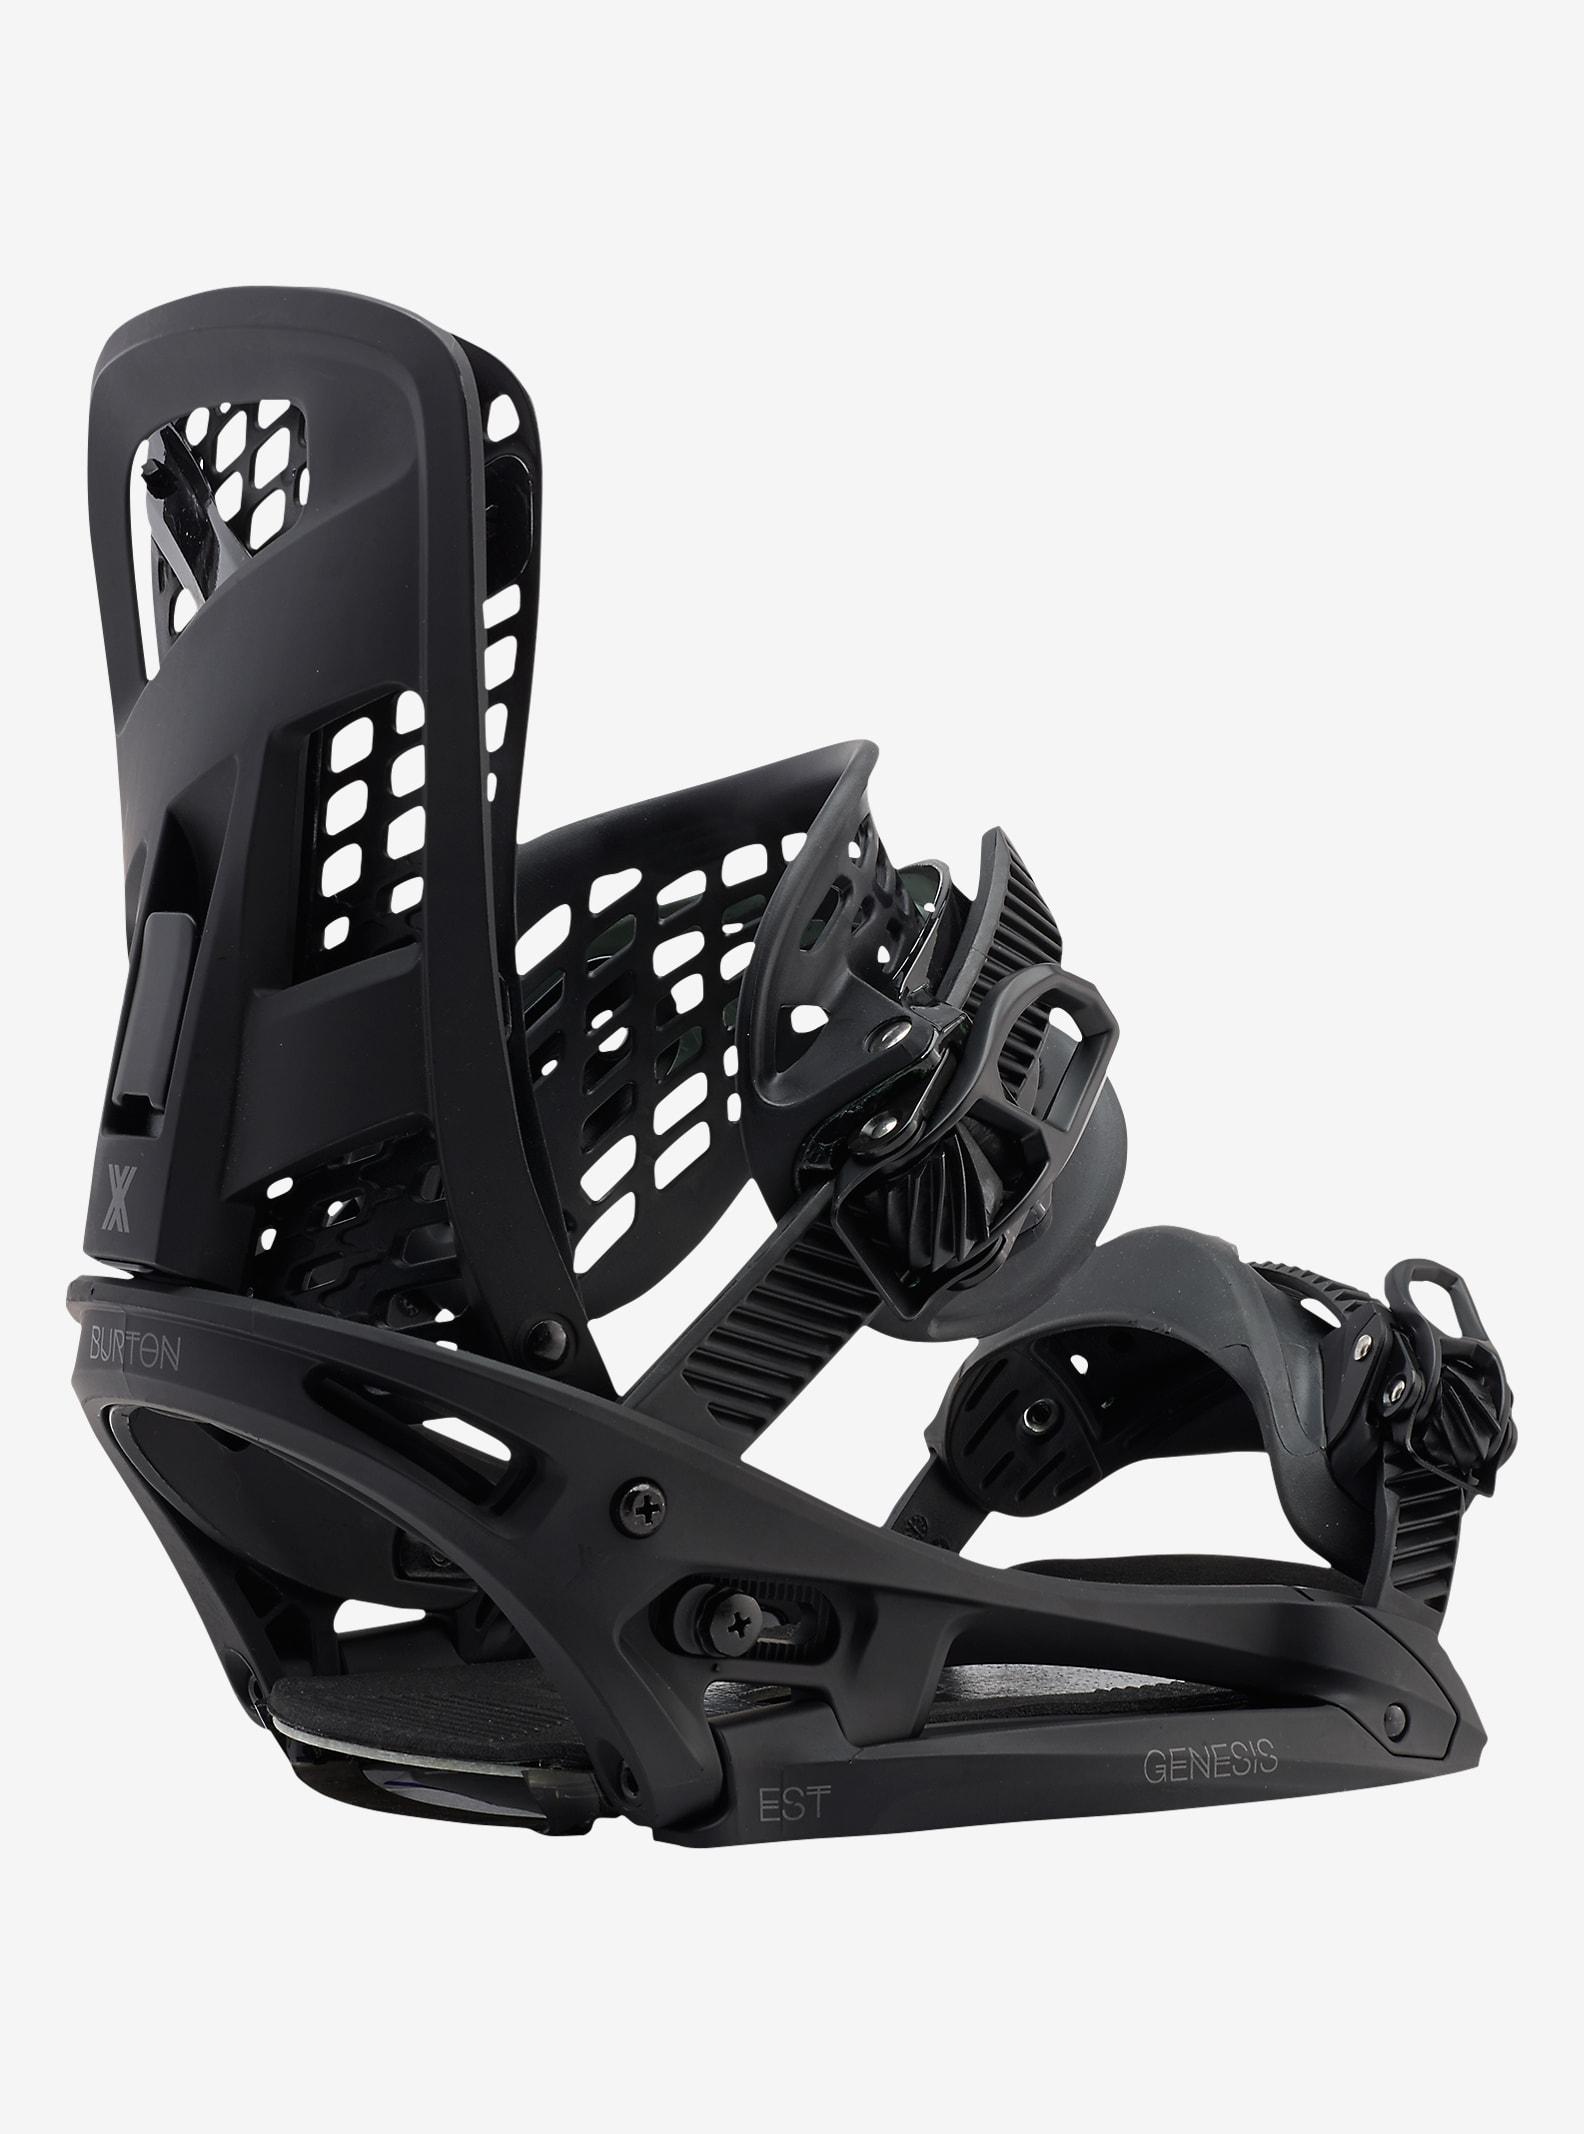 Burton Genesis X EST Snowboardbindung angezeigt in Black